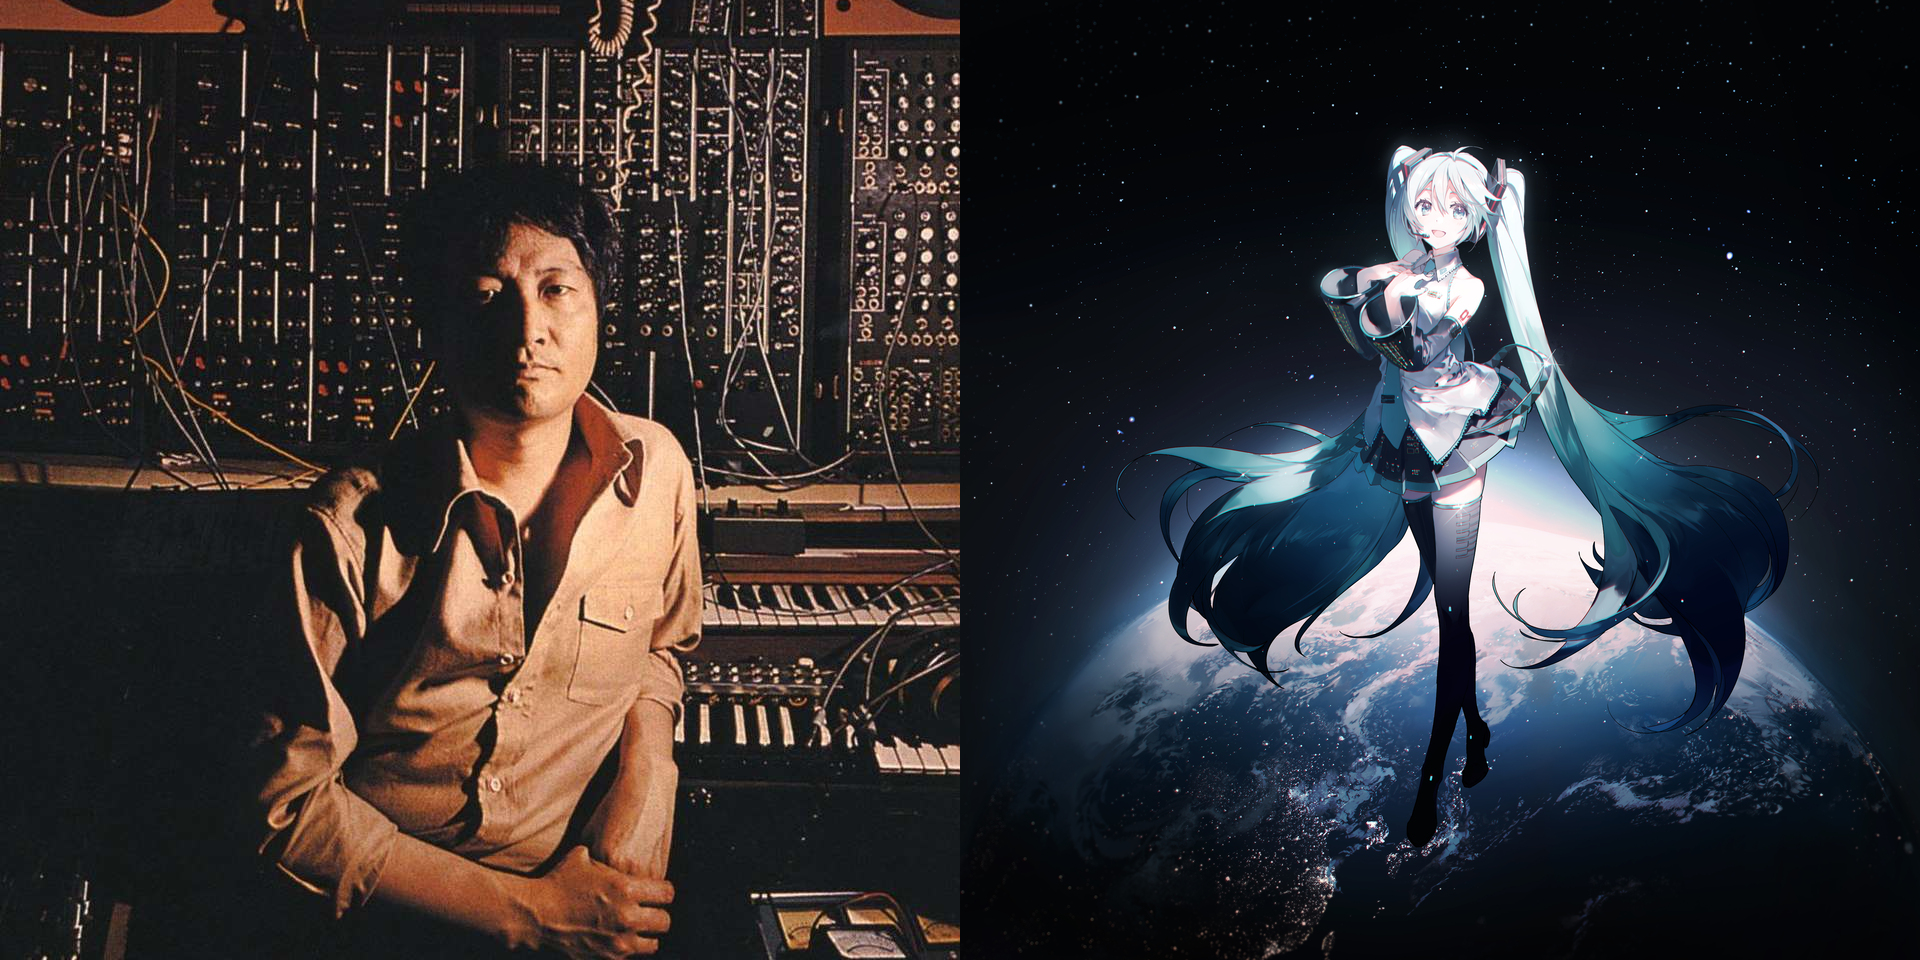 Isao Tomita's 'Symphony Ihatov' featuring Hatsune Miku is coming on vinyl